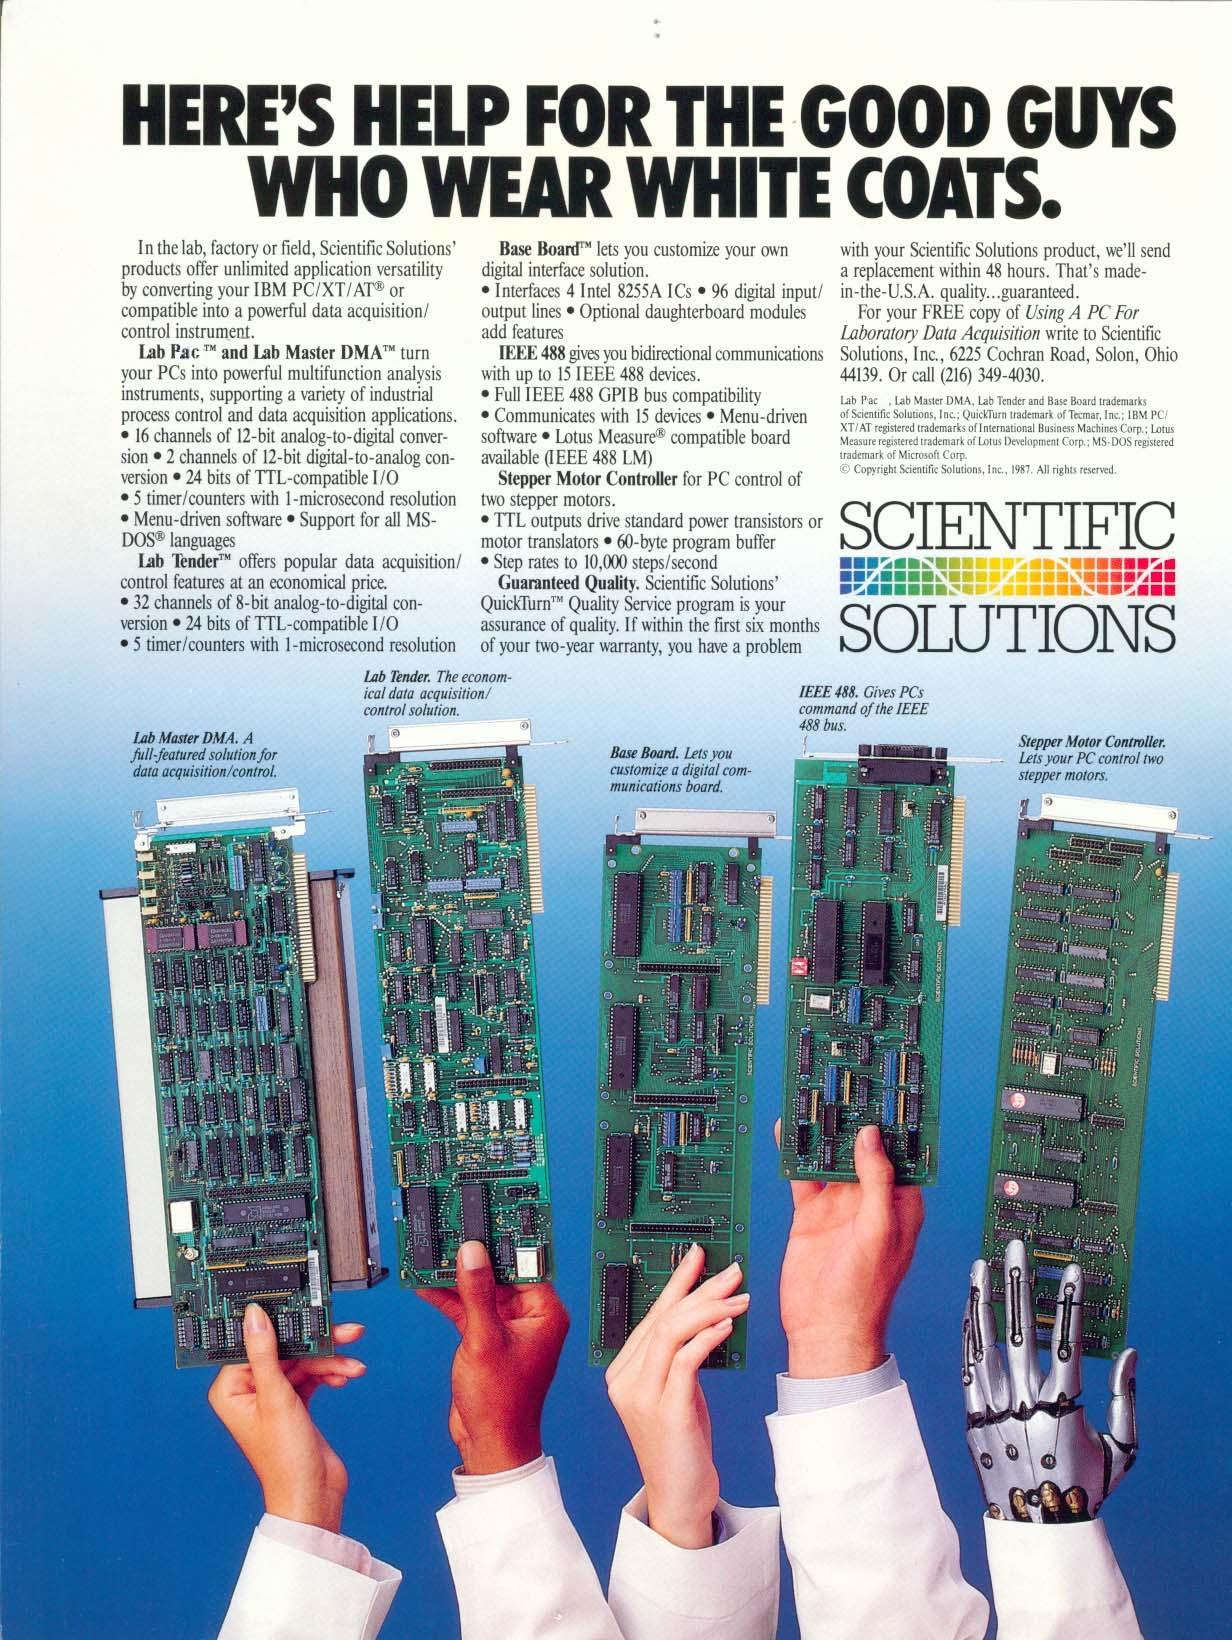 Scientific Solutions Inc. - History